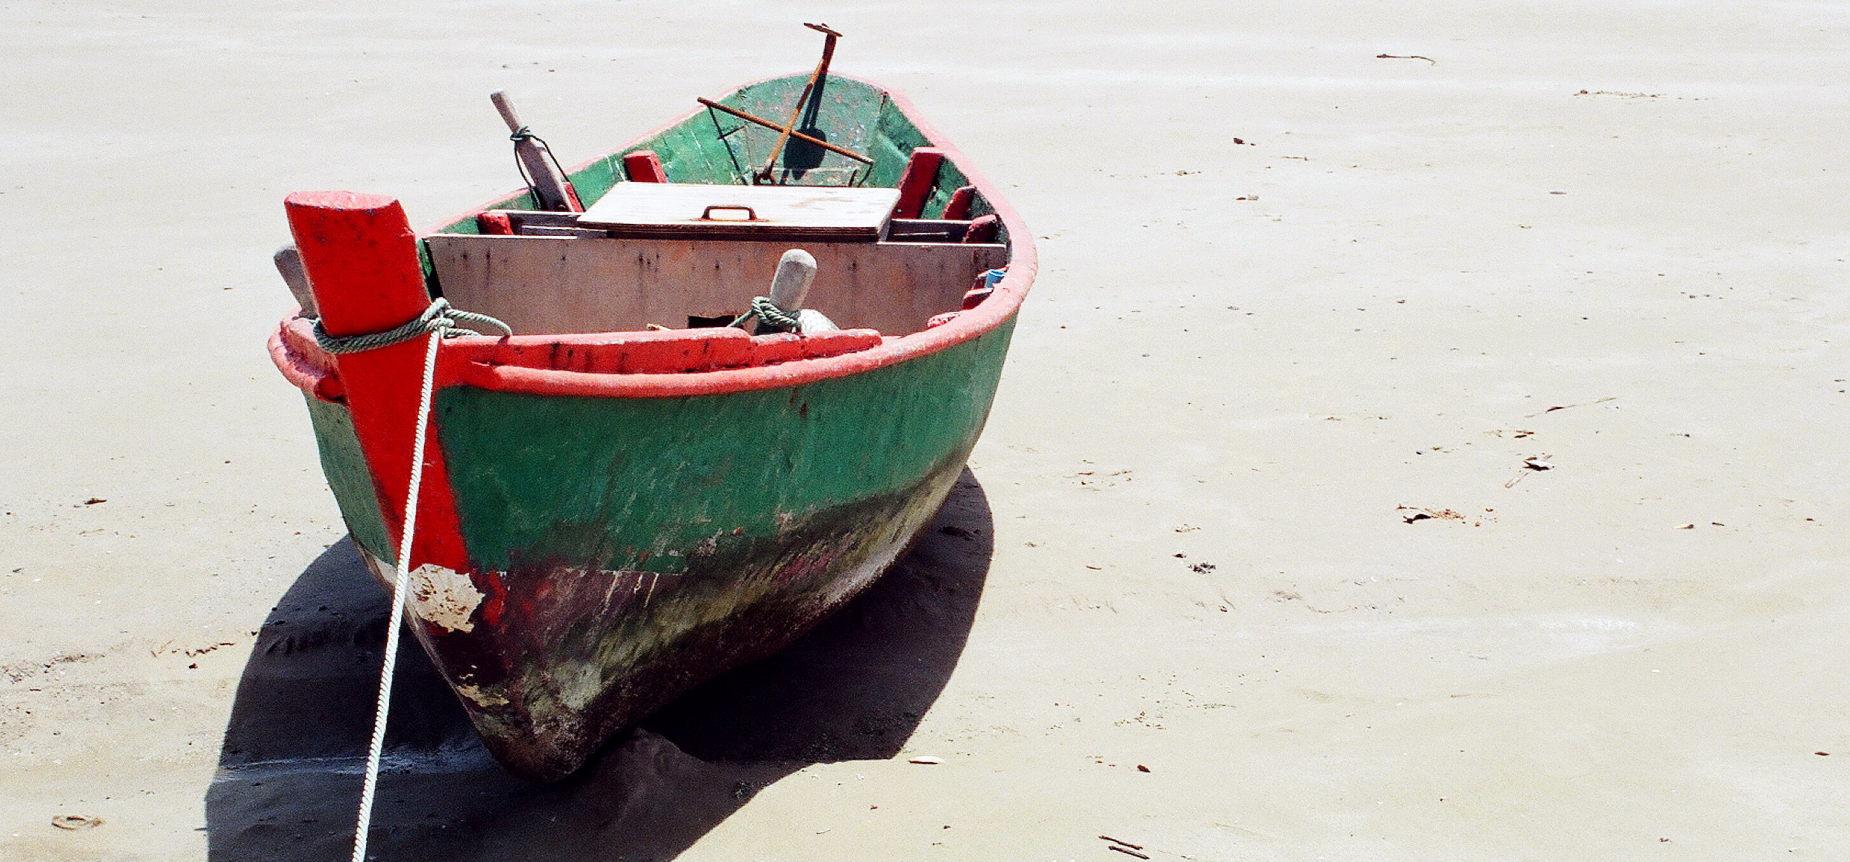 Empty green boat